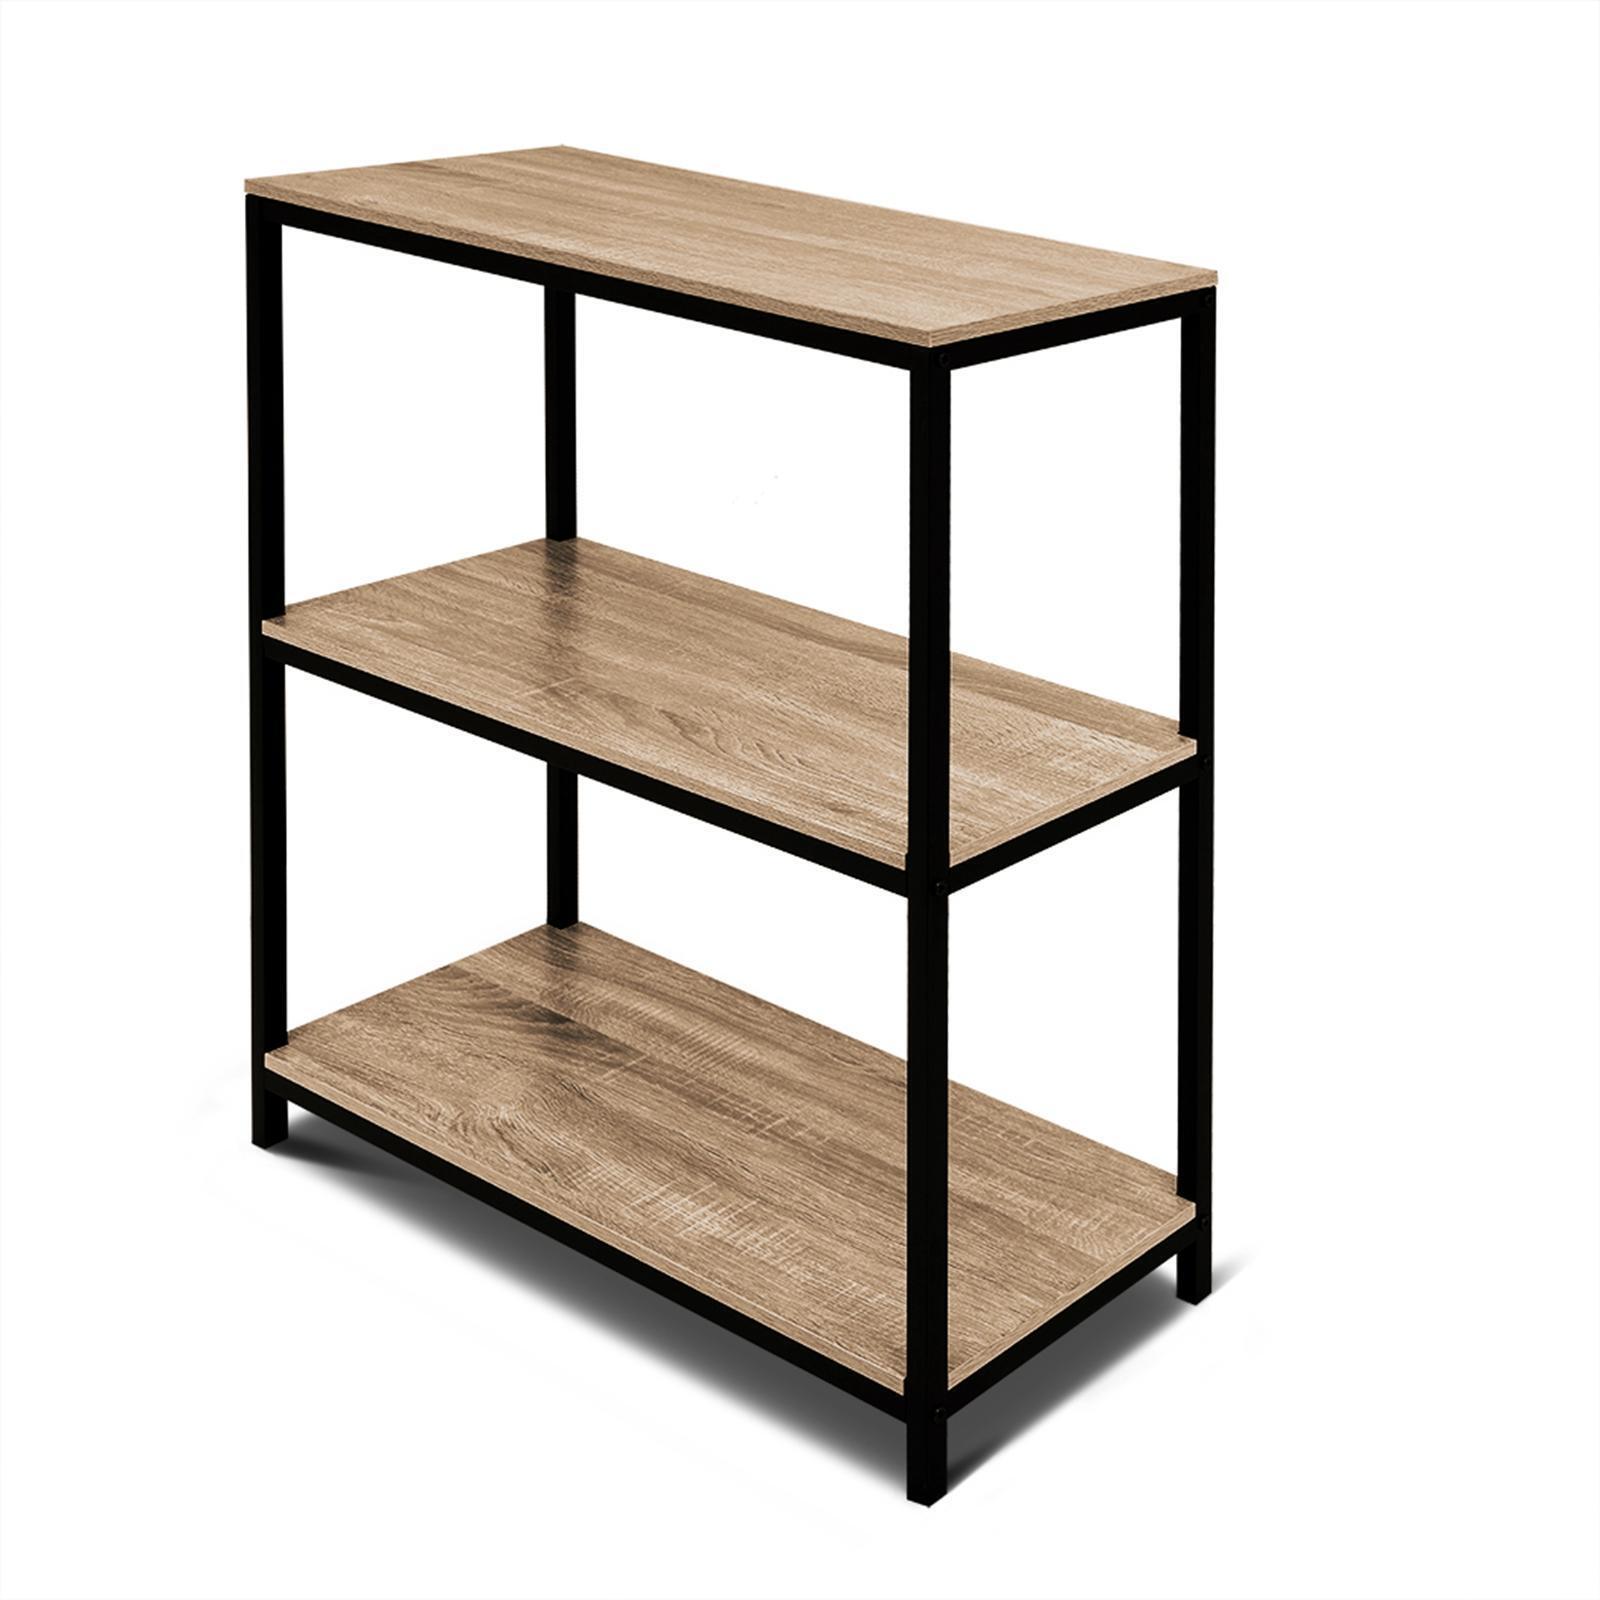 Rome Oak Industrial Style 20 Tier Storage Bookshelf